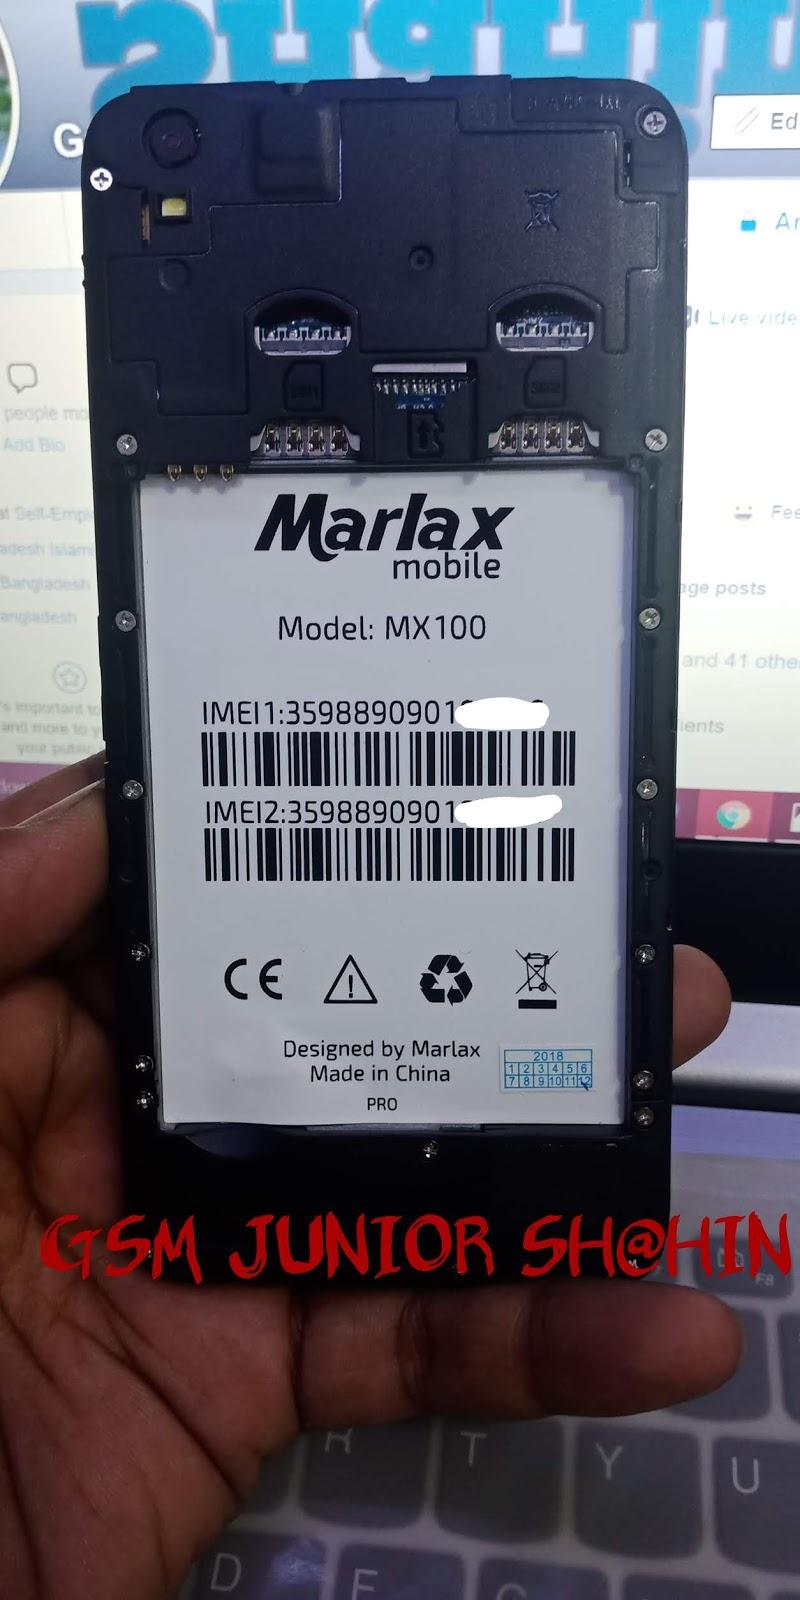 MARLAX MX100 MT6580 FLASH FILE HANG ON LOGO FIX FIRMWARE